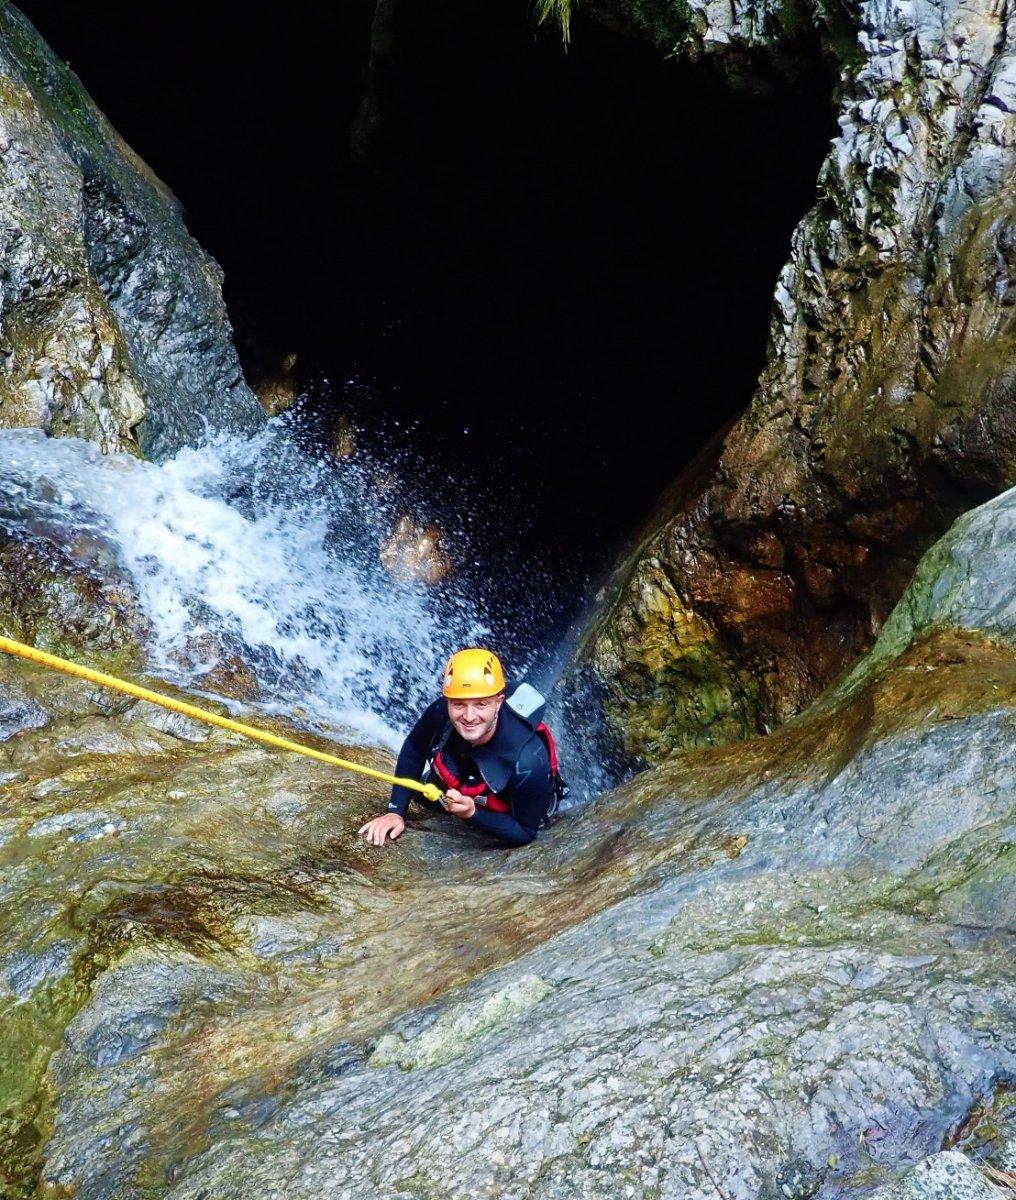 event-Canyoning Adrenalinico sulle Acque del Torrente Palvico - MATTINA